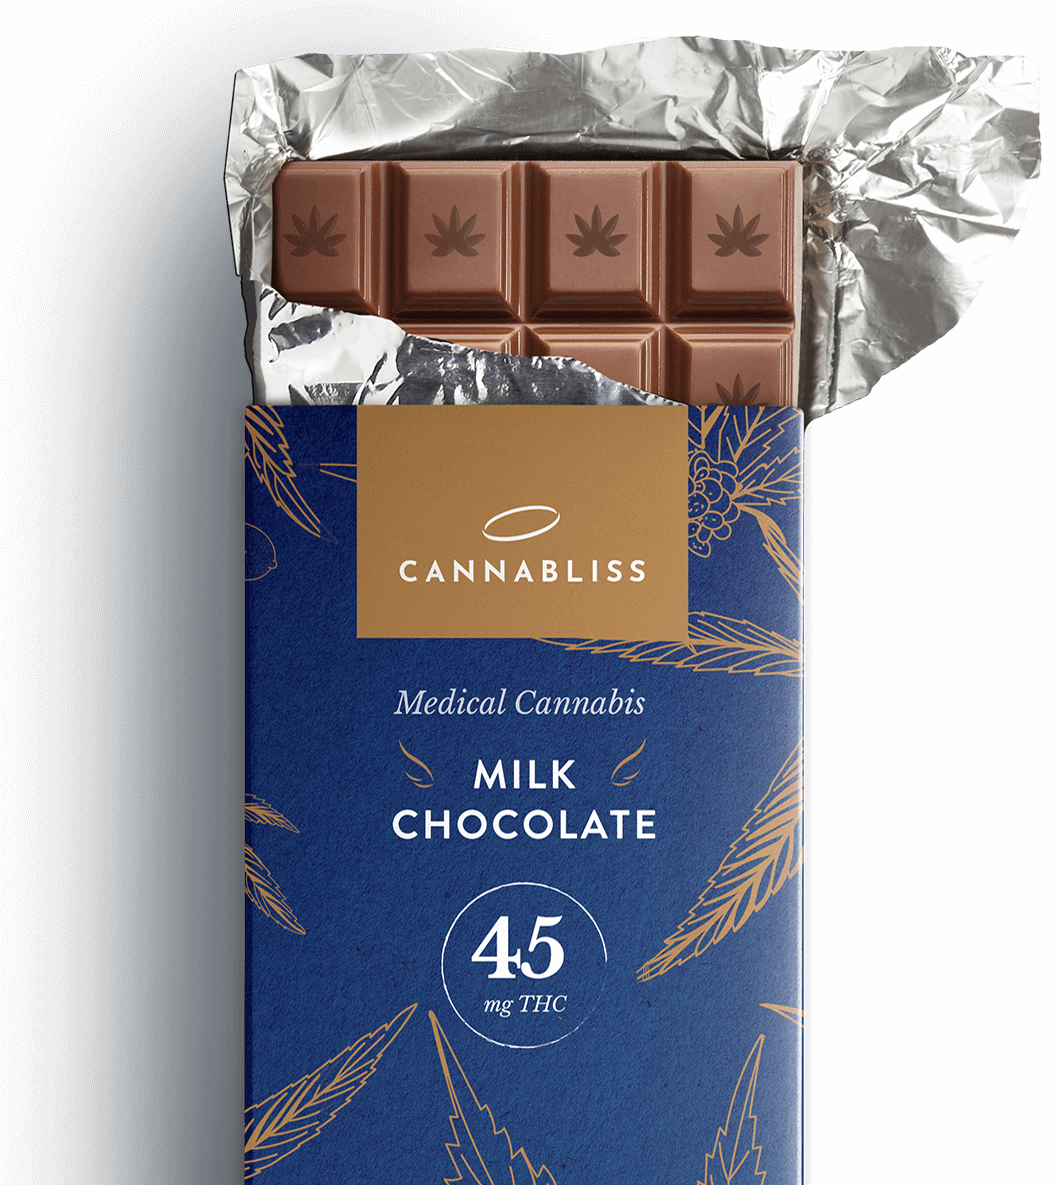 https://socbd.fr/wp-content/uploads/2019/01/home-04-chocolate-bar.png